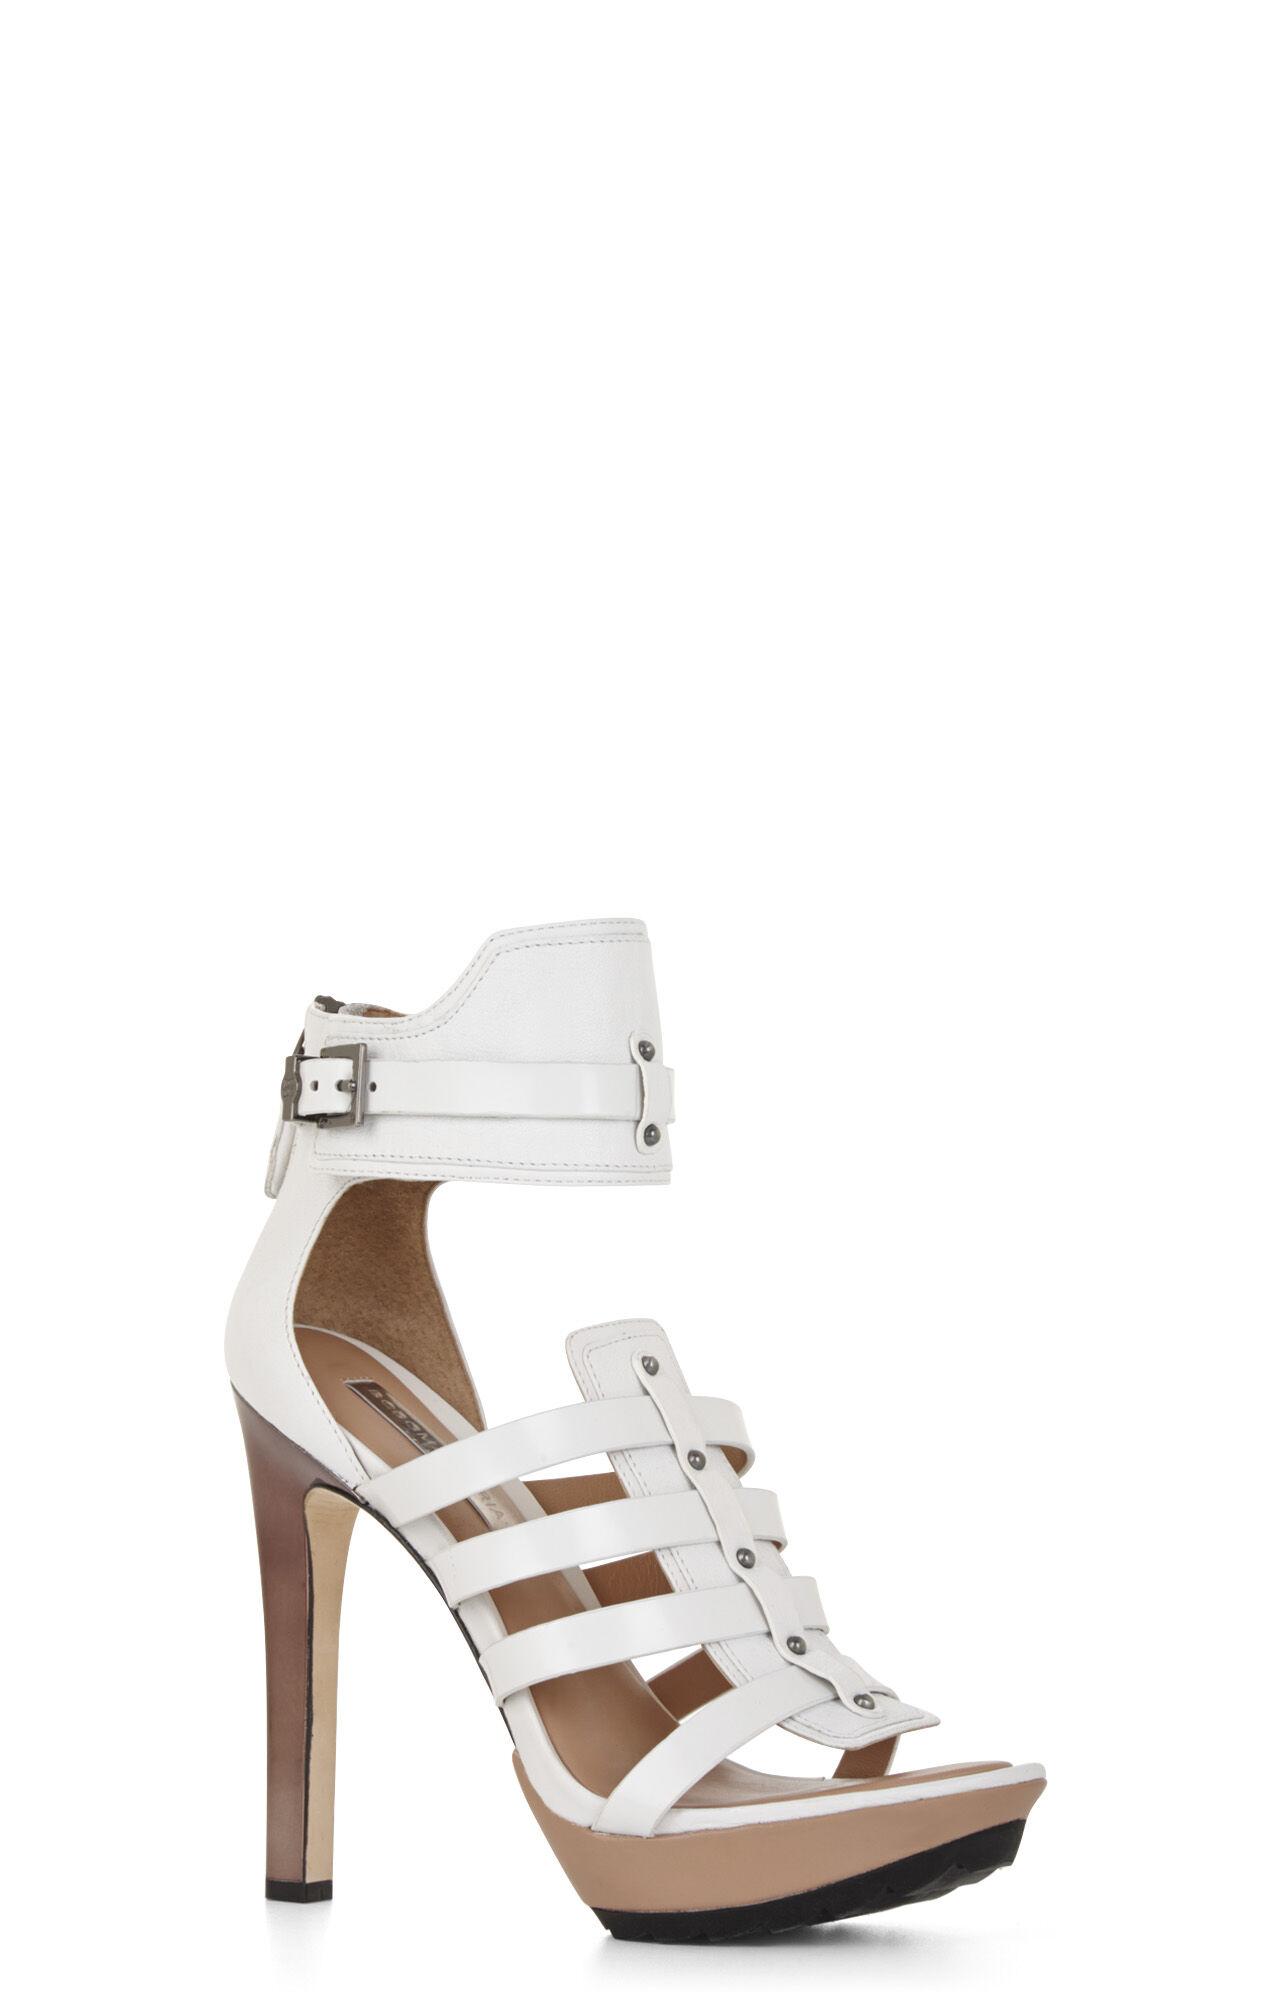 Rana High-Heel Platform Sandal